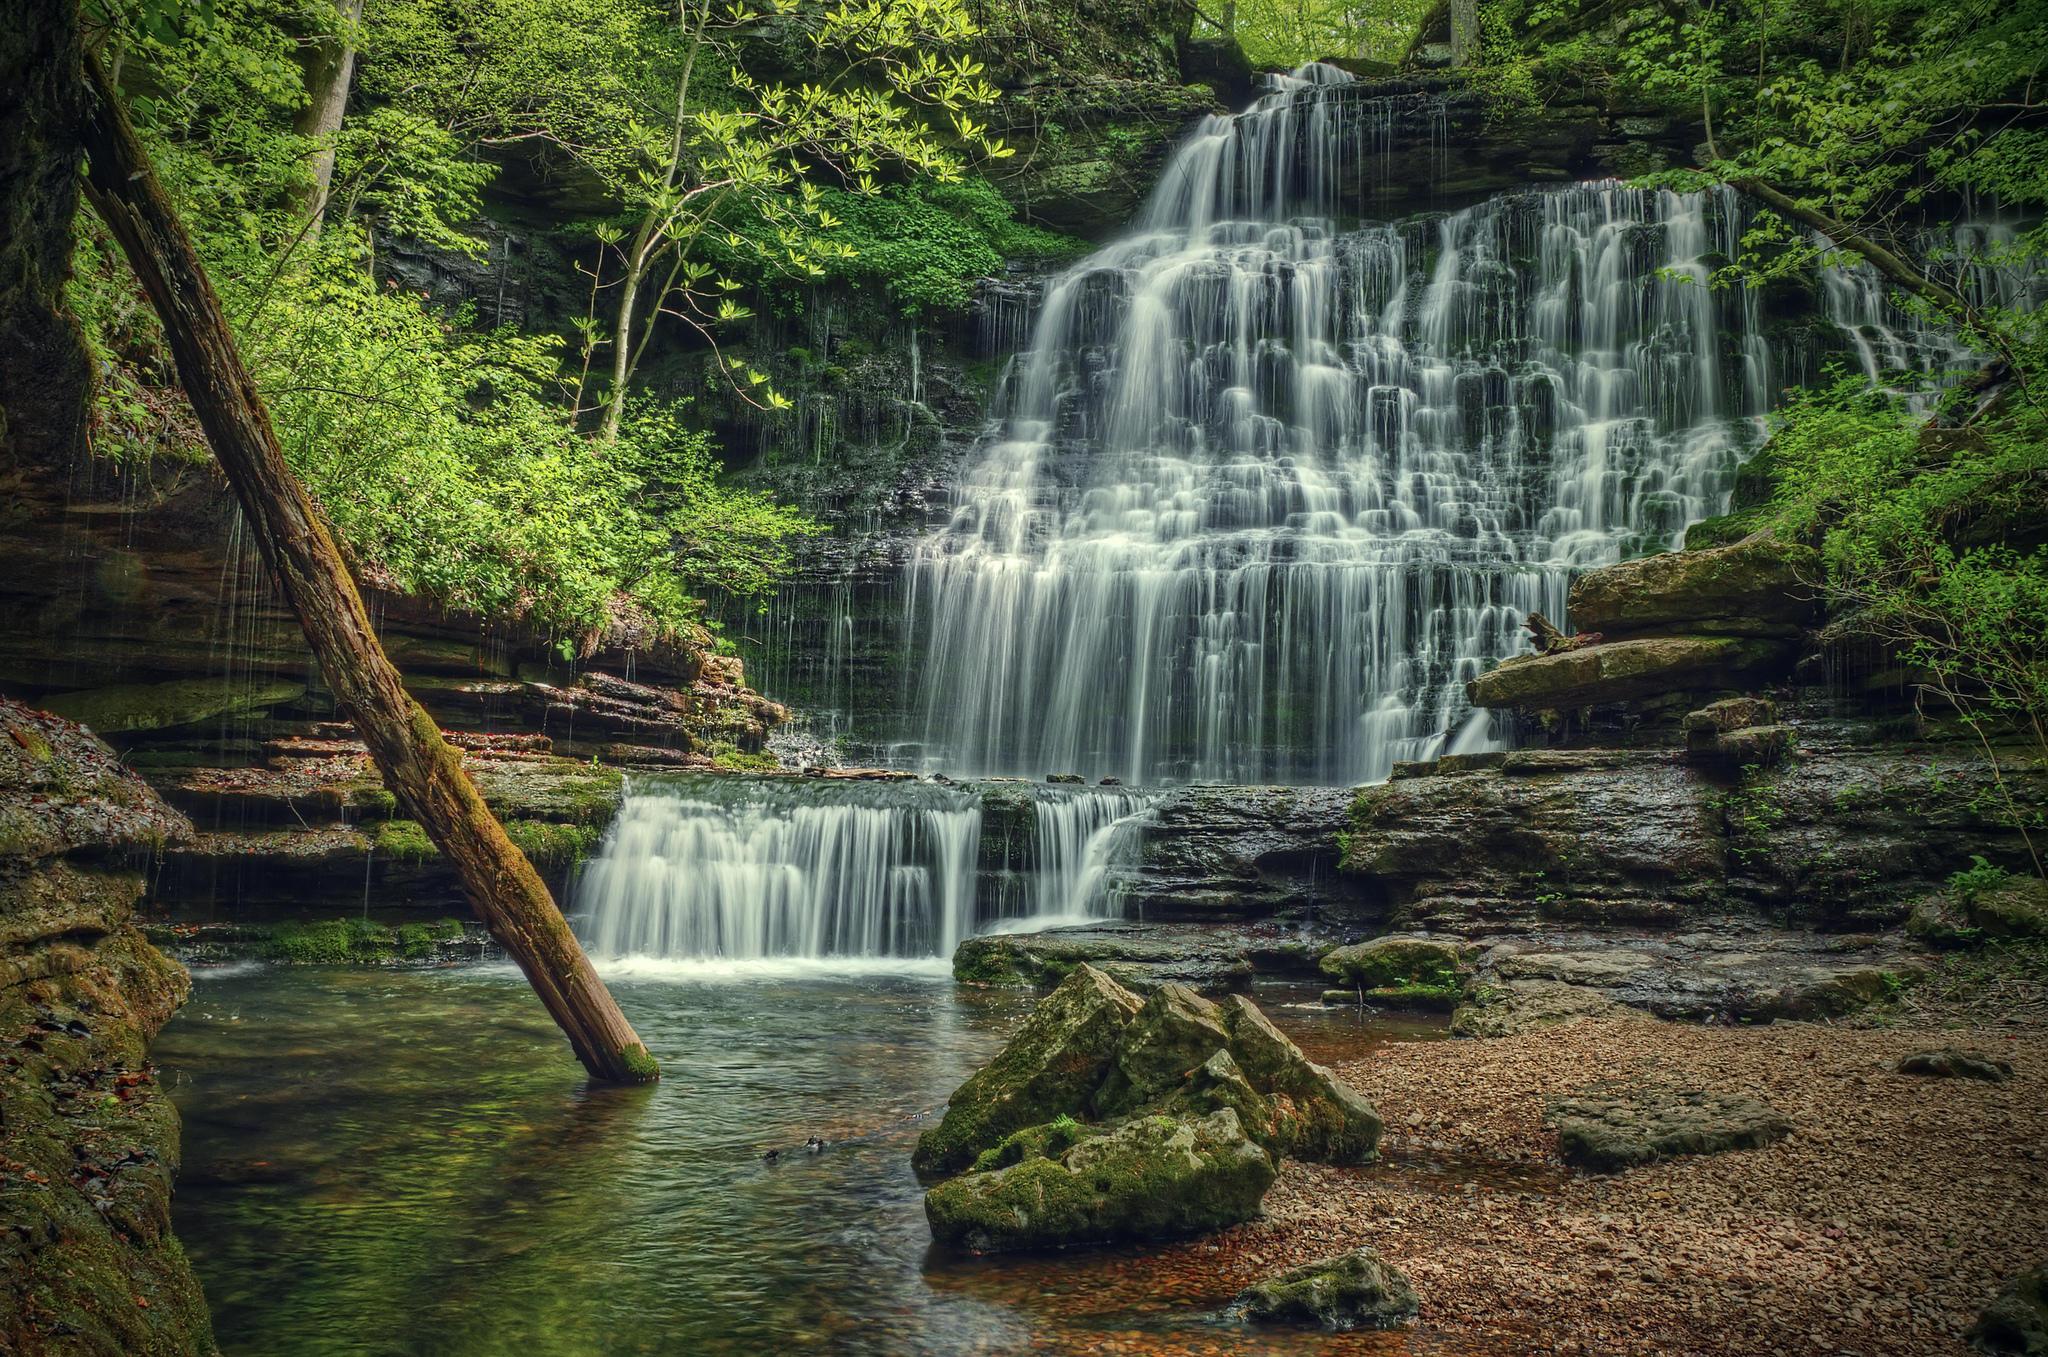 обои лес, деревья, речка, водопад картинки фото